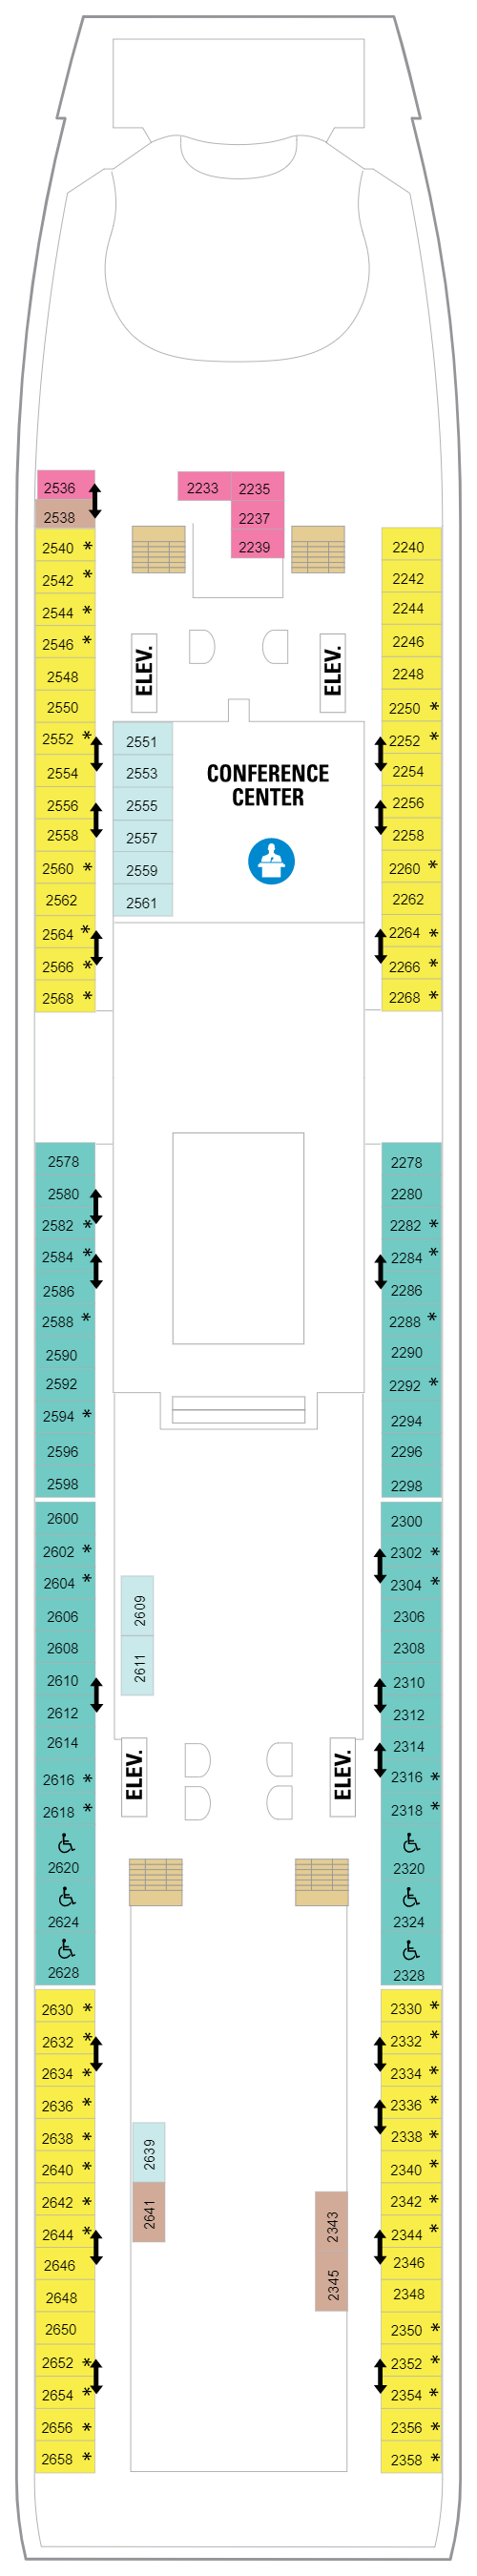 Deck 2 (April 21st, 2021 - April 30th, 2022)